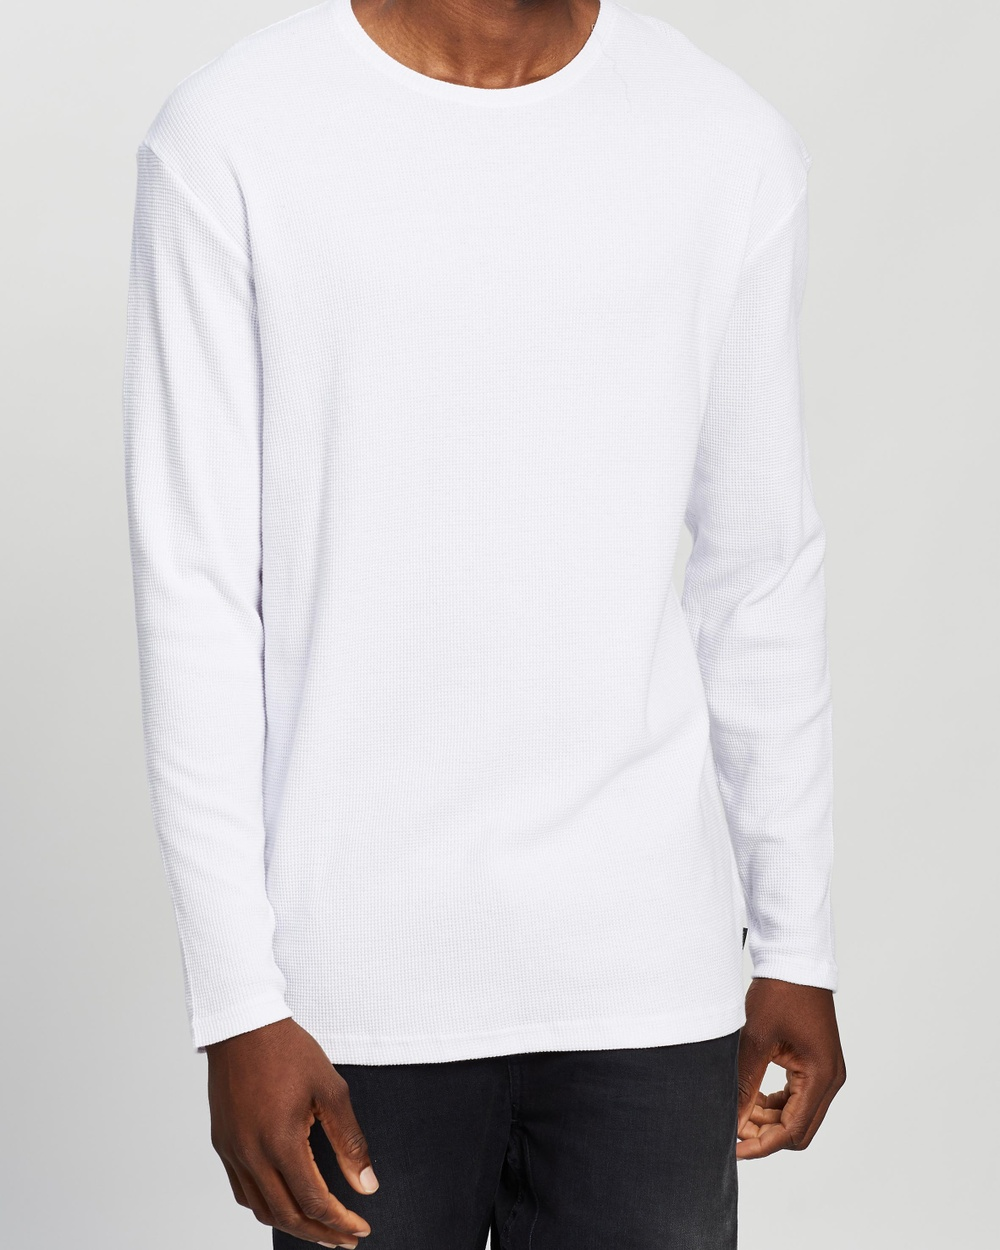 Silent Theory - Acid Waffle LS Tee - T-Shirts & Singlets (White) Acid Waffle LS Tee